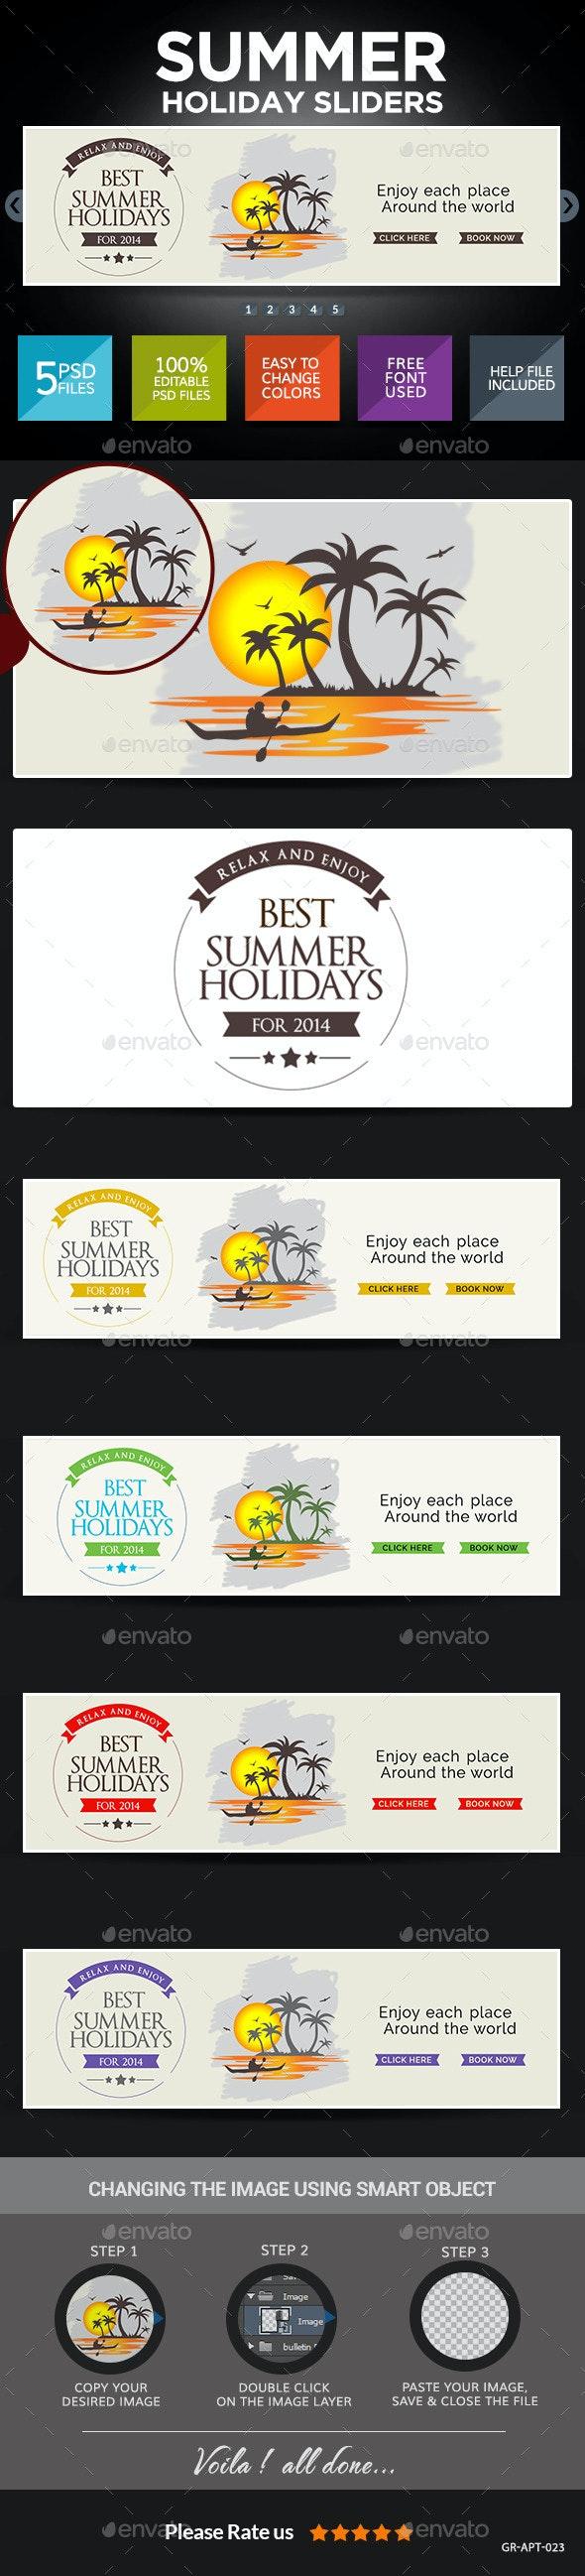 Summer Travel Sliders - Sliders & Features Web Elements